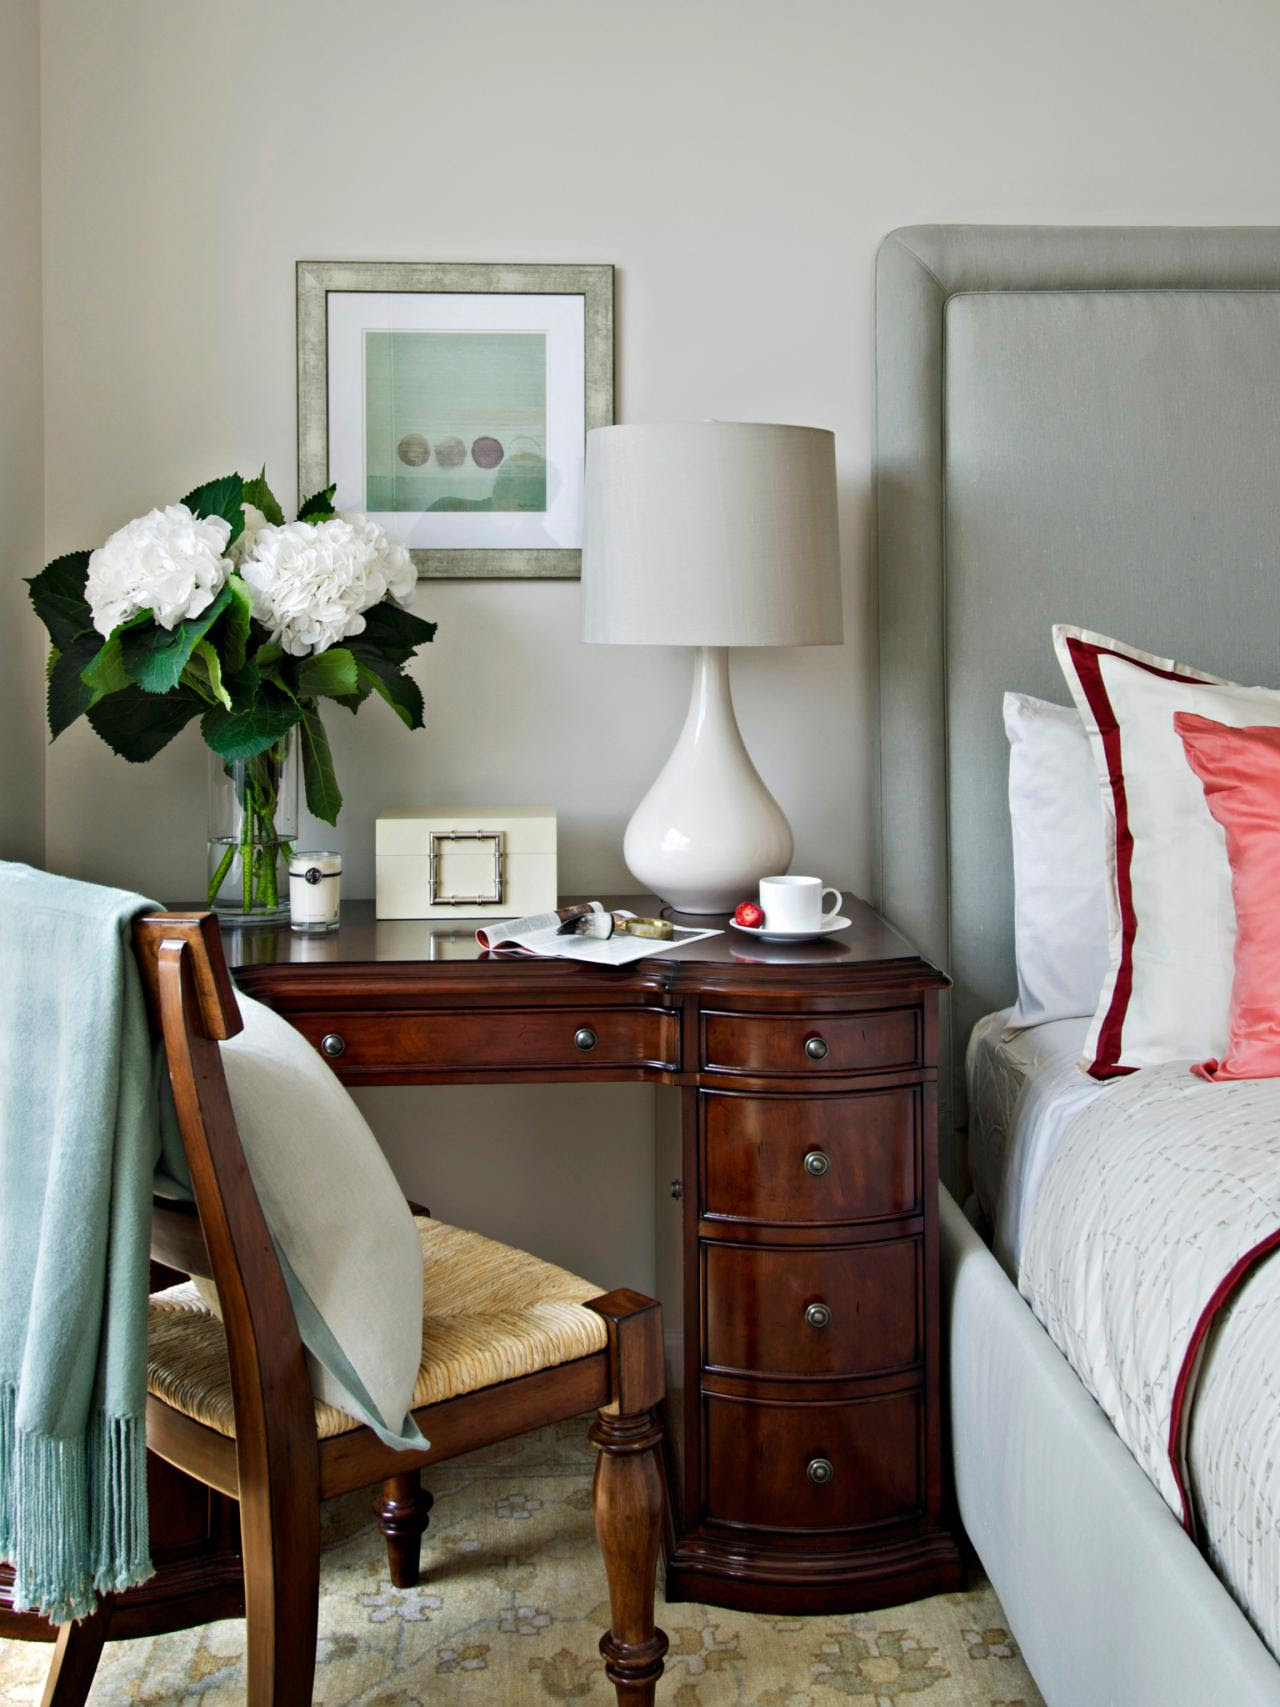 original_Frances Herrera vanity desk as bedroom nightstand_v